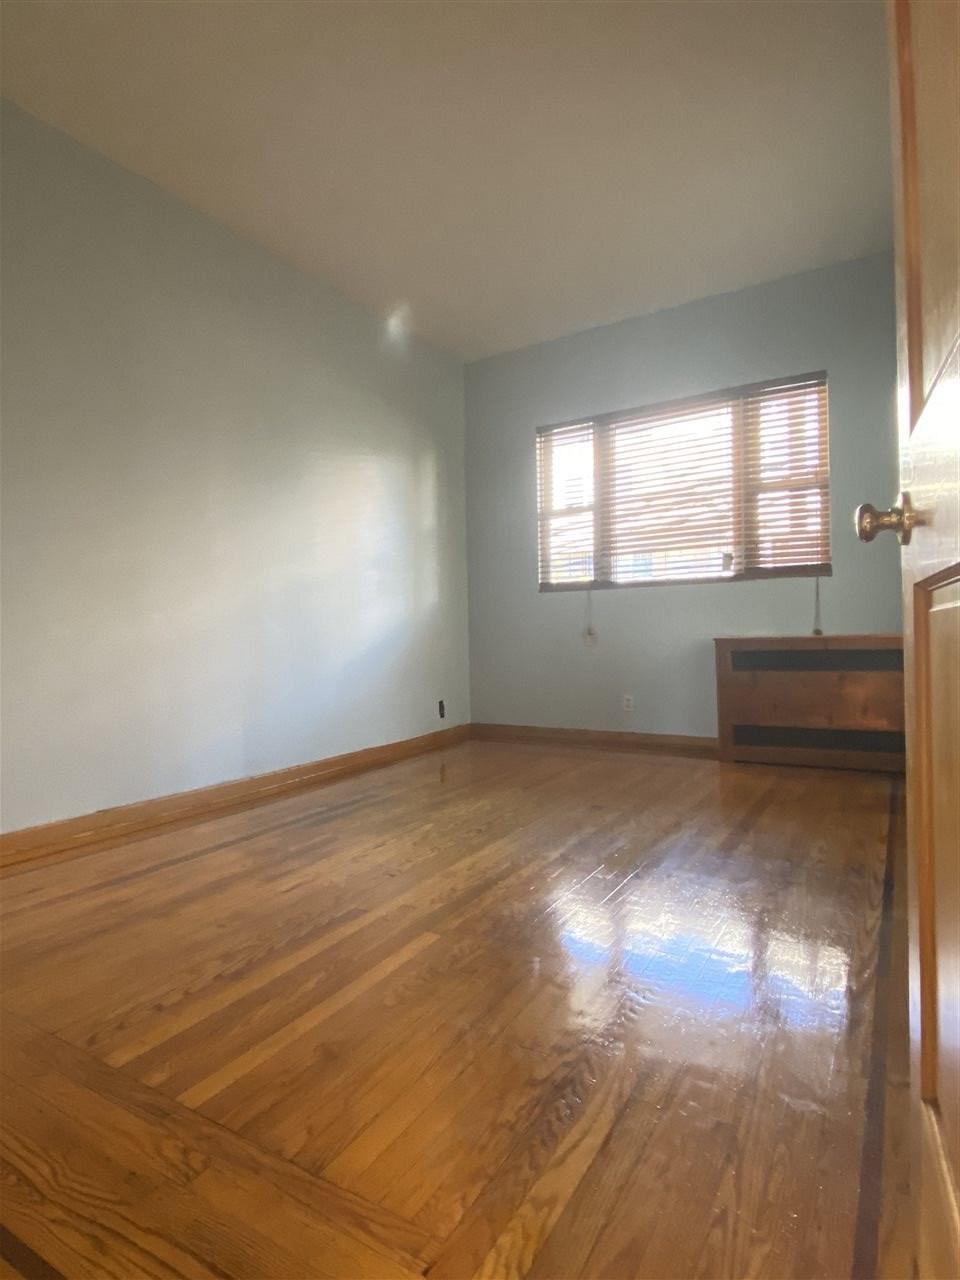 1203 51ST ST, North Bergen, New Jersey 07047, 3 Bedrooms Bedrooms, ,2 BathroomsBathrooms,Residential,For Sale,1203 51ST ST,202025933